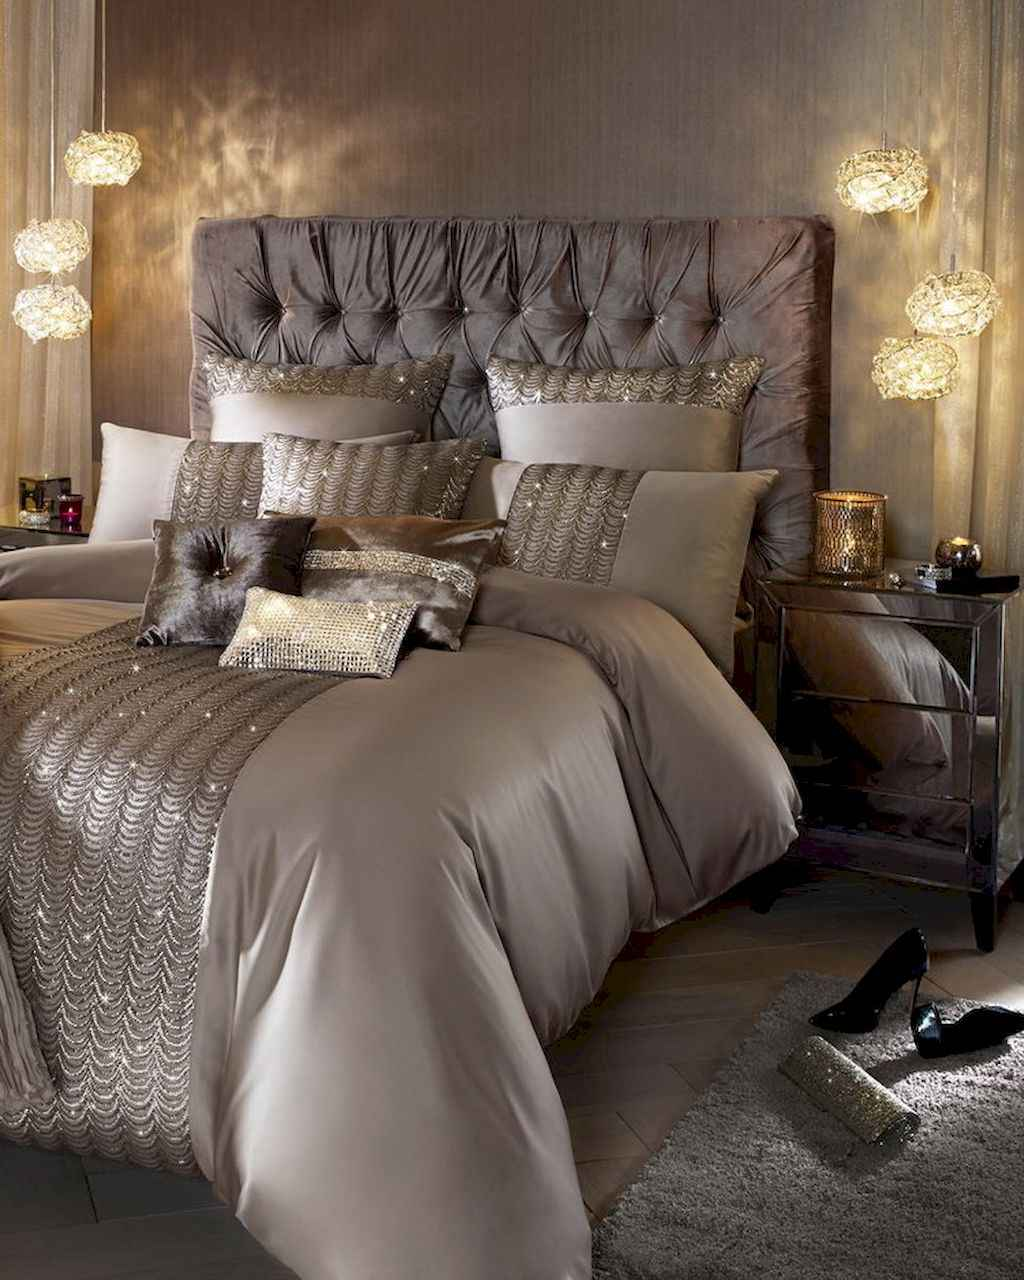 Incredible master bedroom ideas (65)